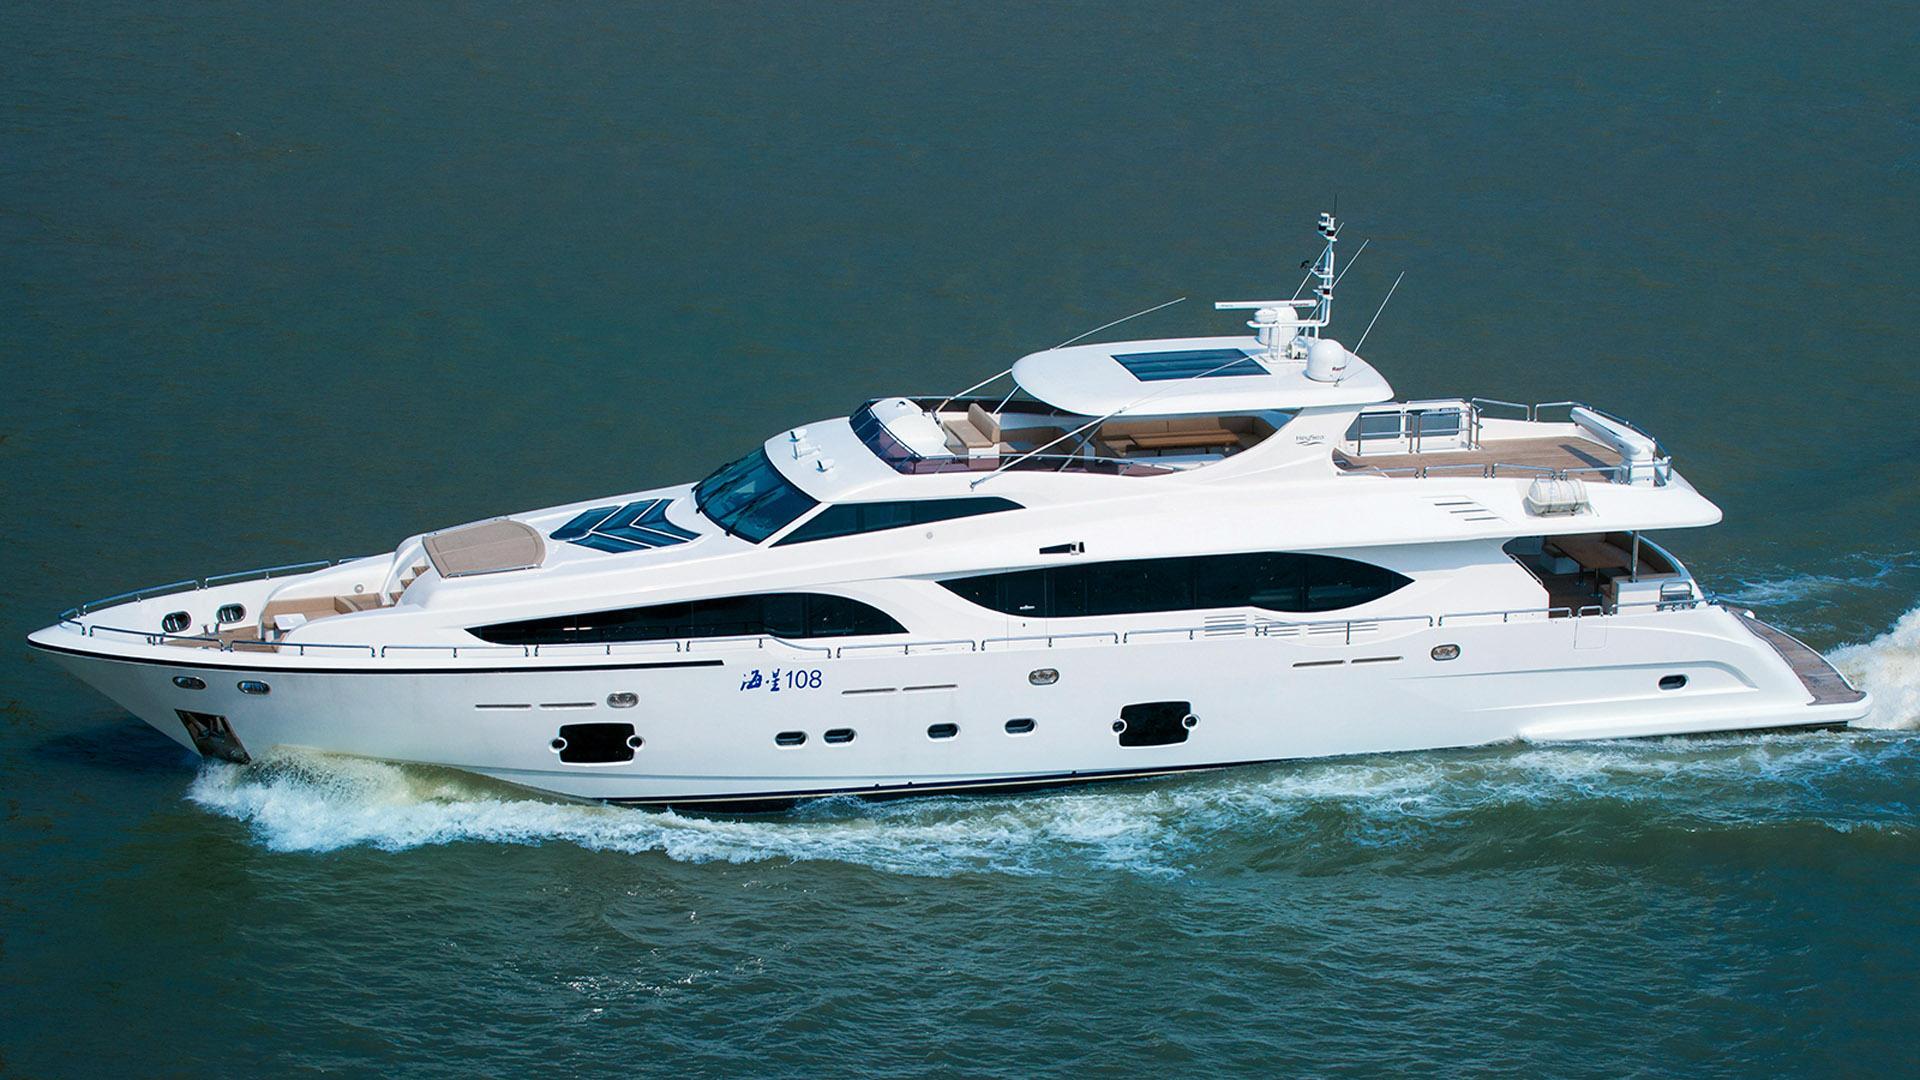 asteria 108 hull 7 motoryacht heysea 2017 33m profile sistership